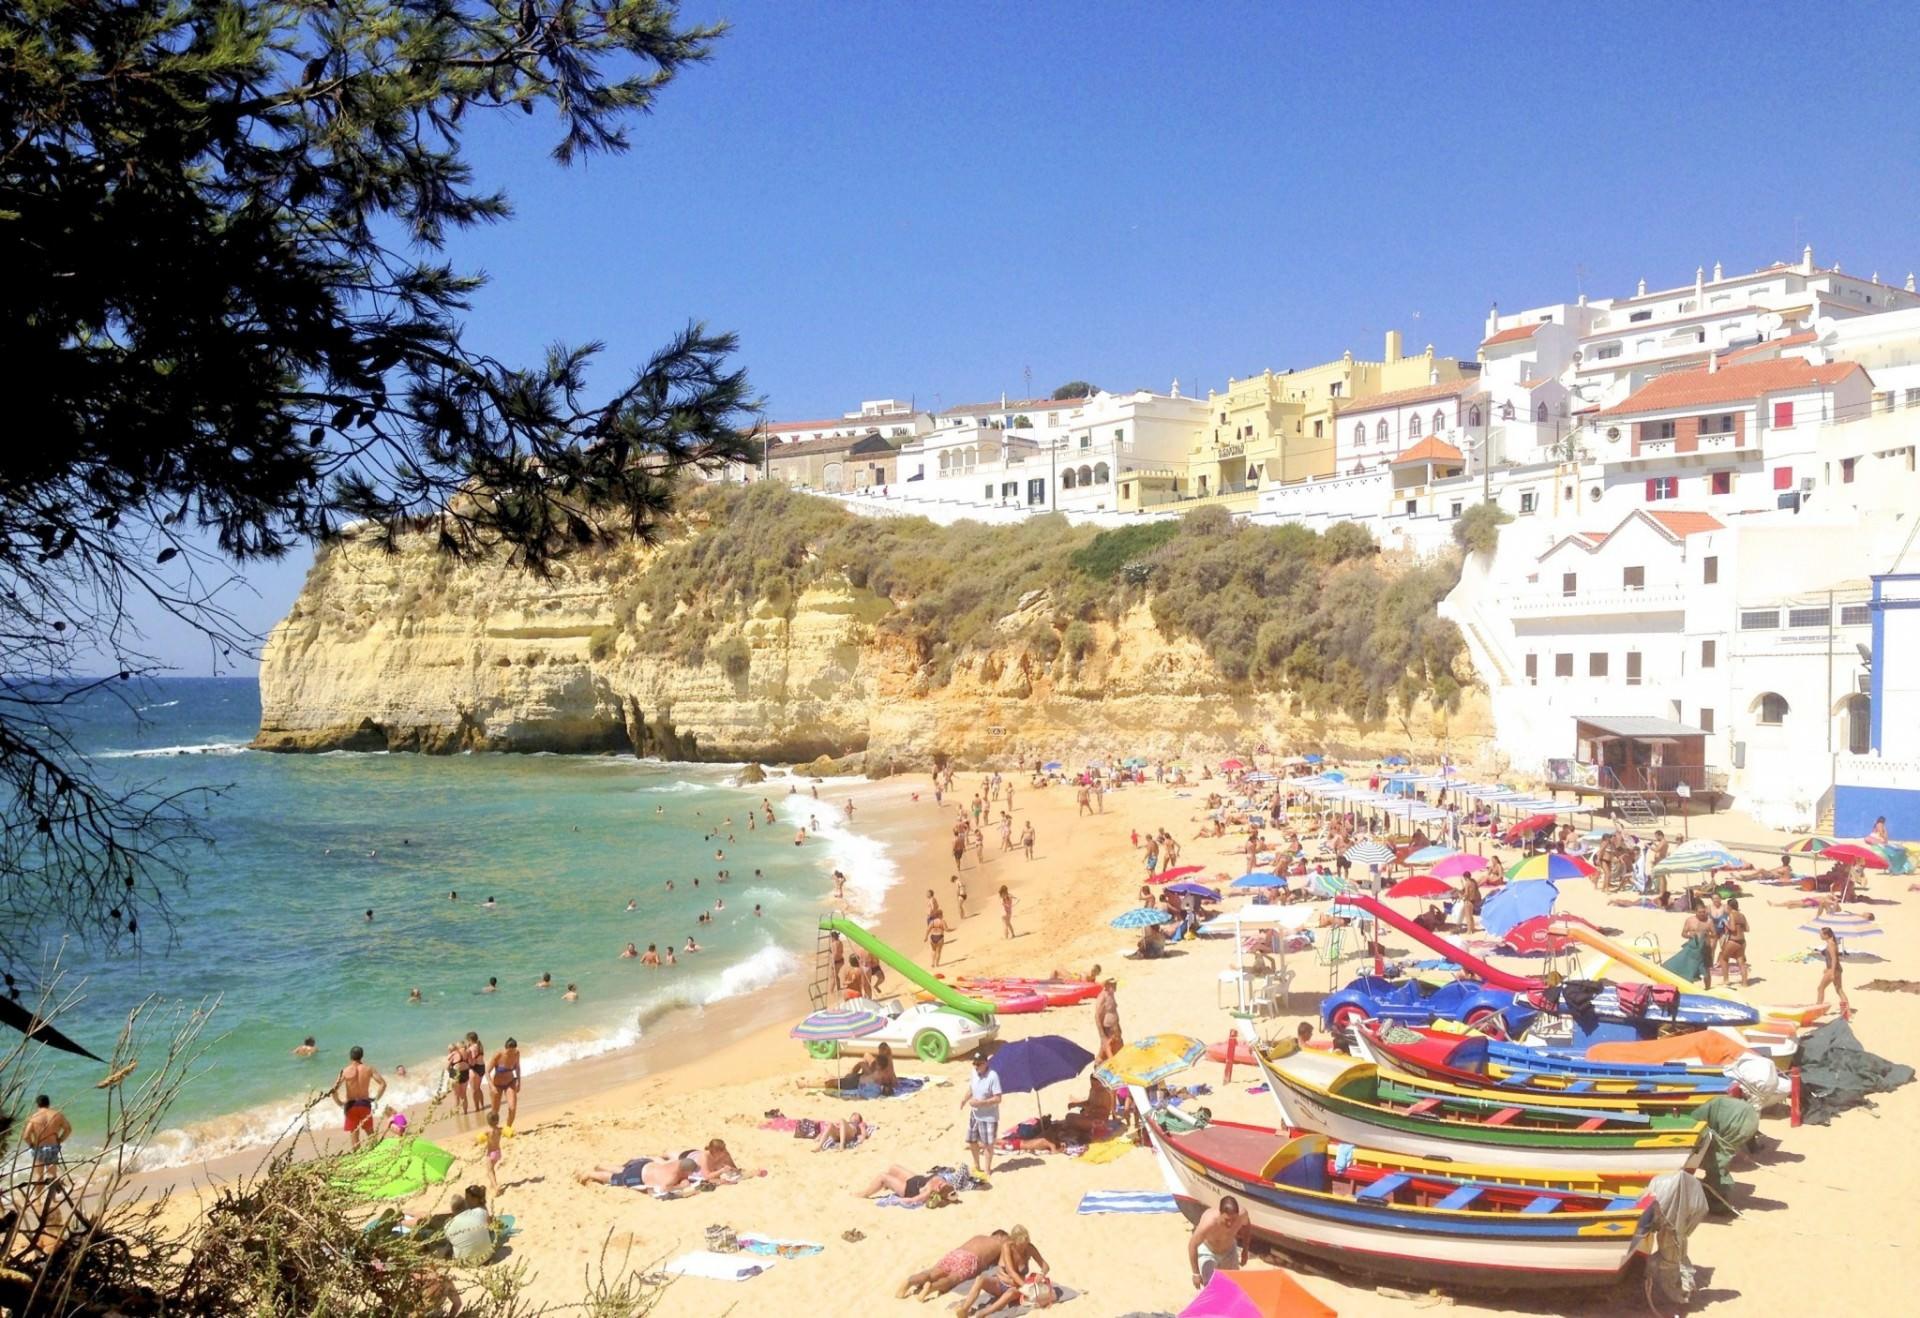 Algarve ・ Praia Da Luz Holidays